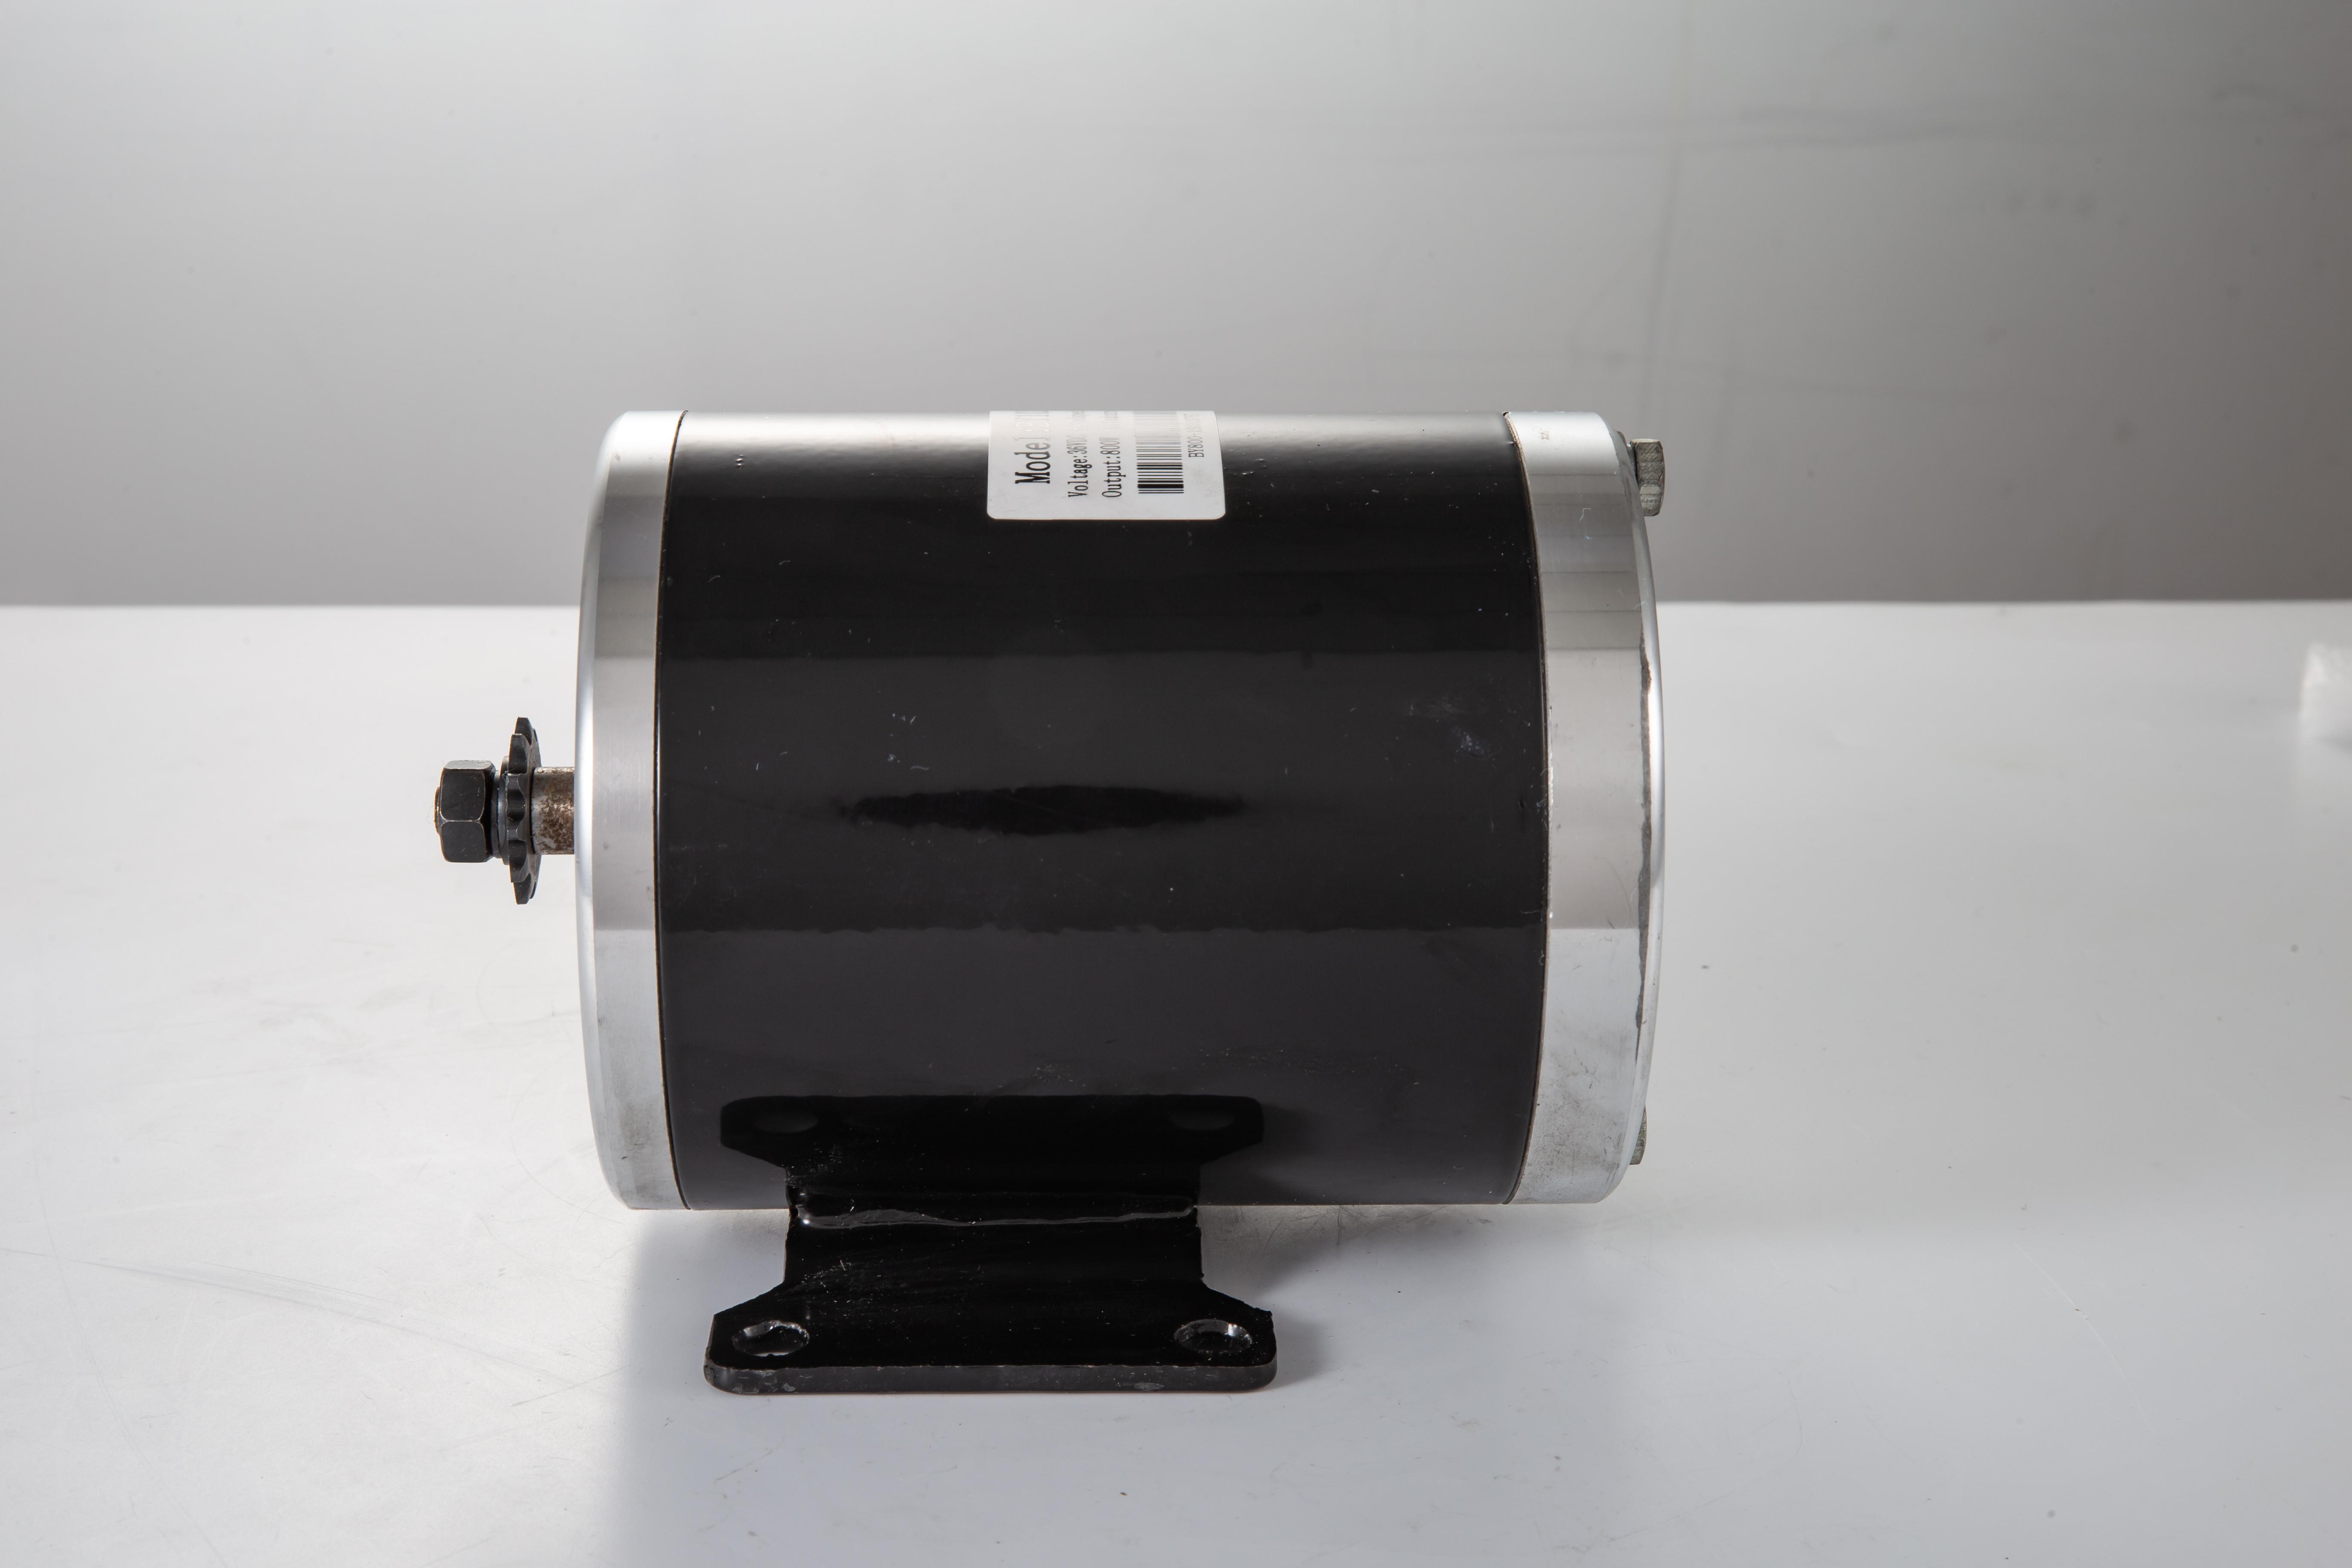 36v-Electric-Motor-controller-throttle-kit-f-Scooter-E-Scooter-ATV-Permanent thumbnail 111